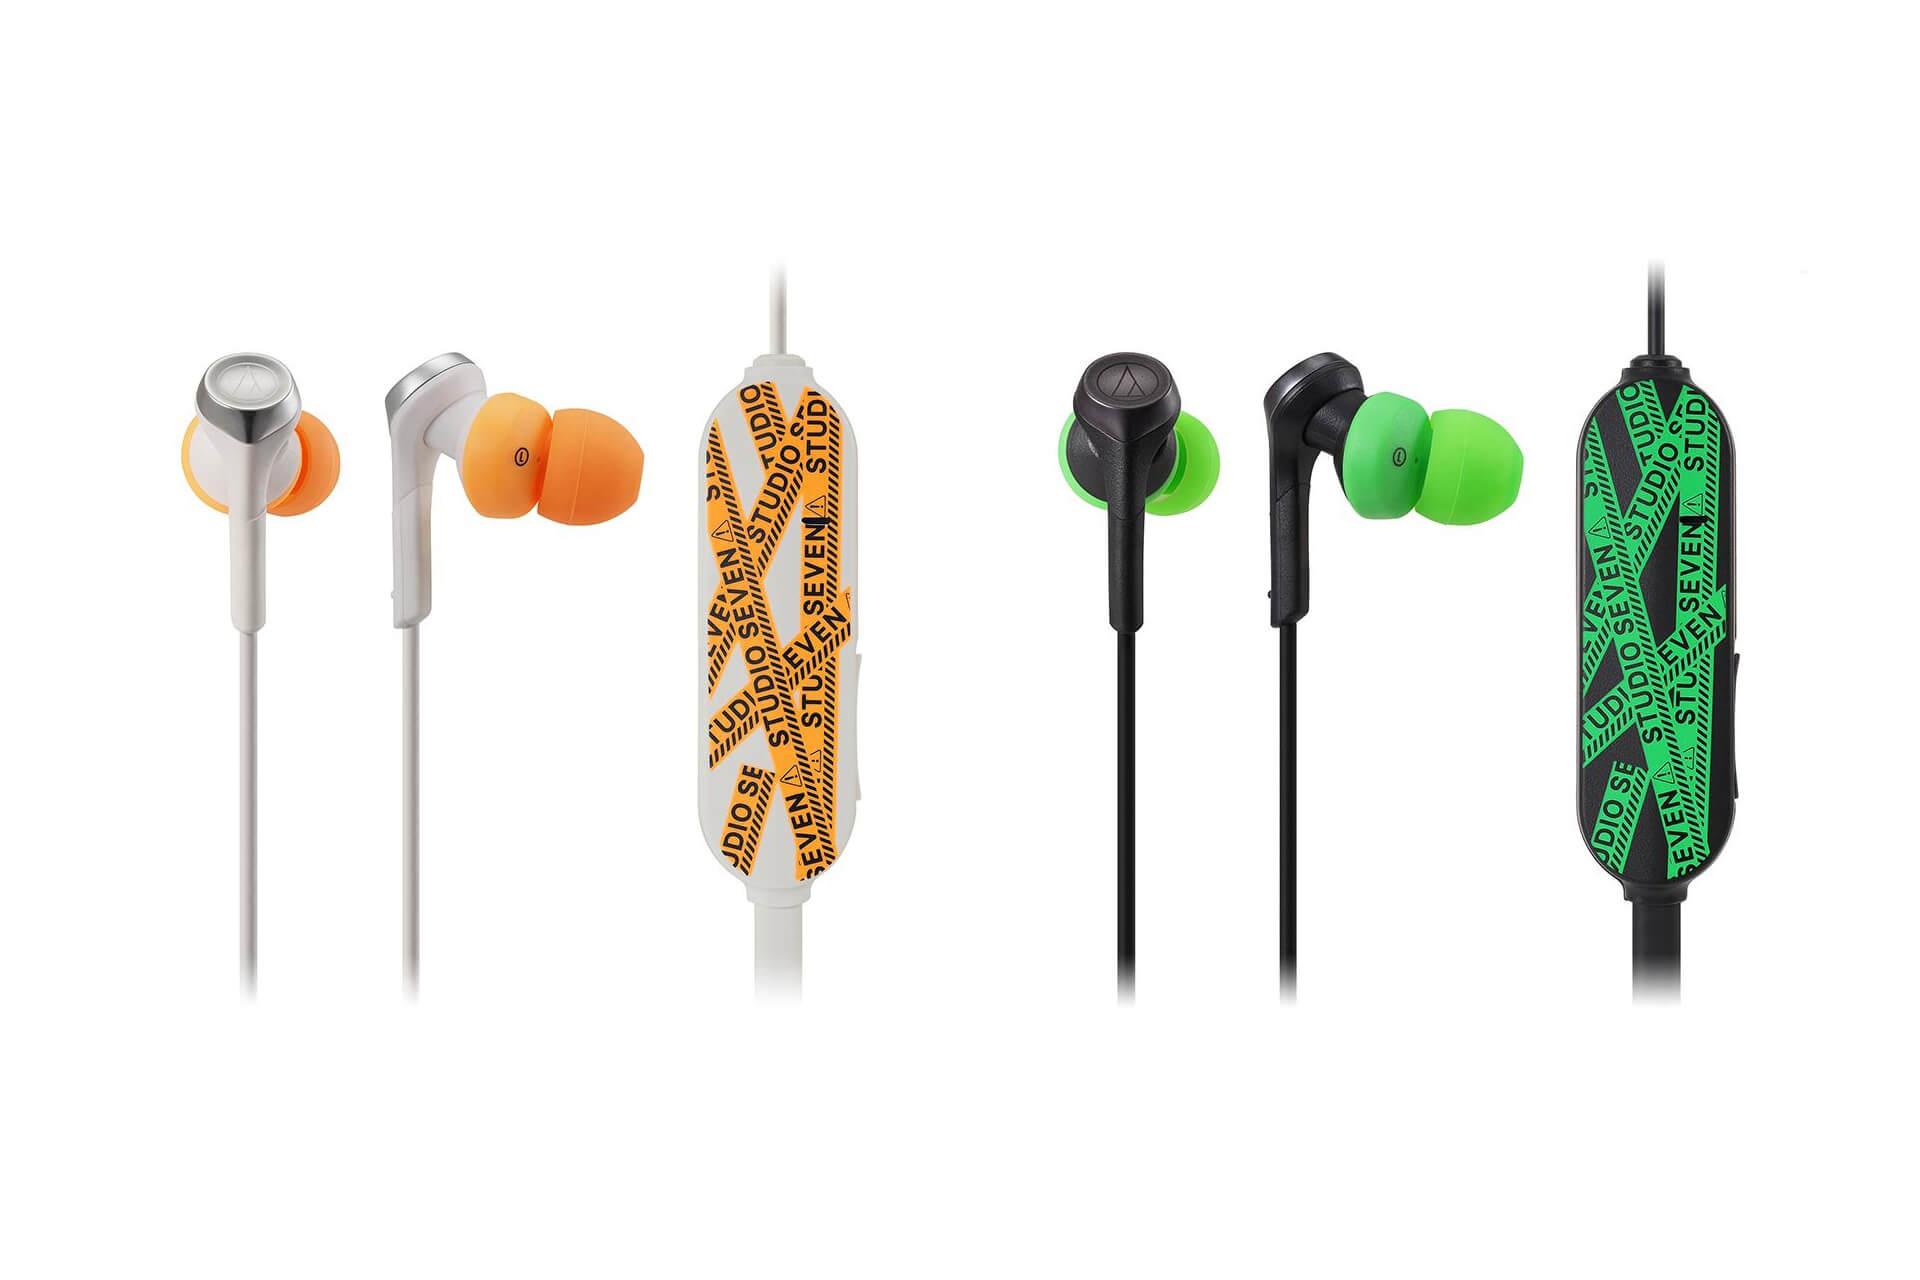 Audio Technicaの人気ワイヤレスイヤホンとNAOTOのファッションブランド「STUDIO SEVEN」がコラボ!数量限定モデルが発売 tech210407_naoto_audiotechnica_7